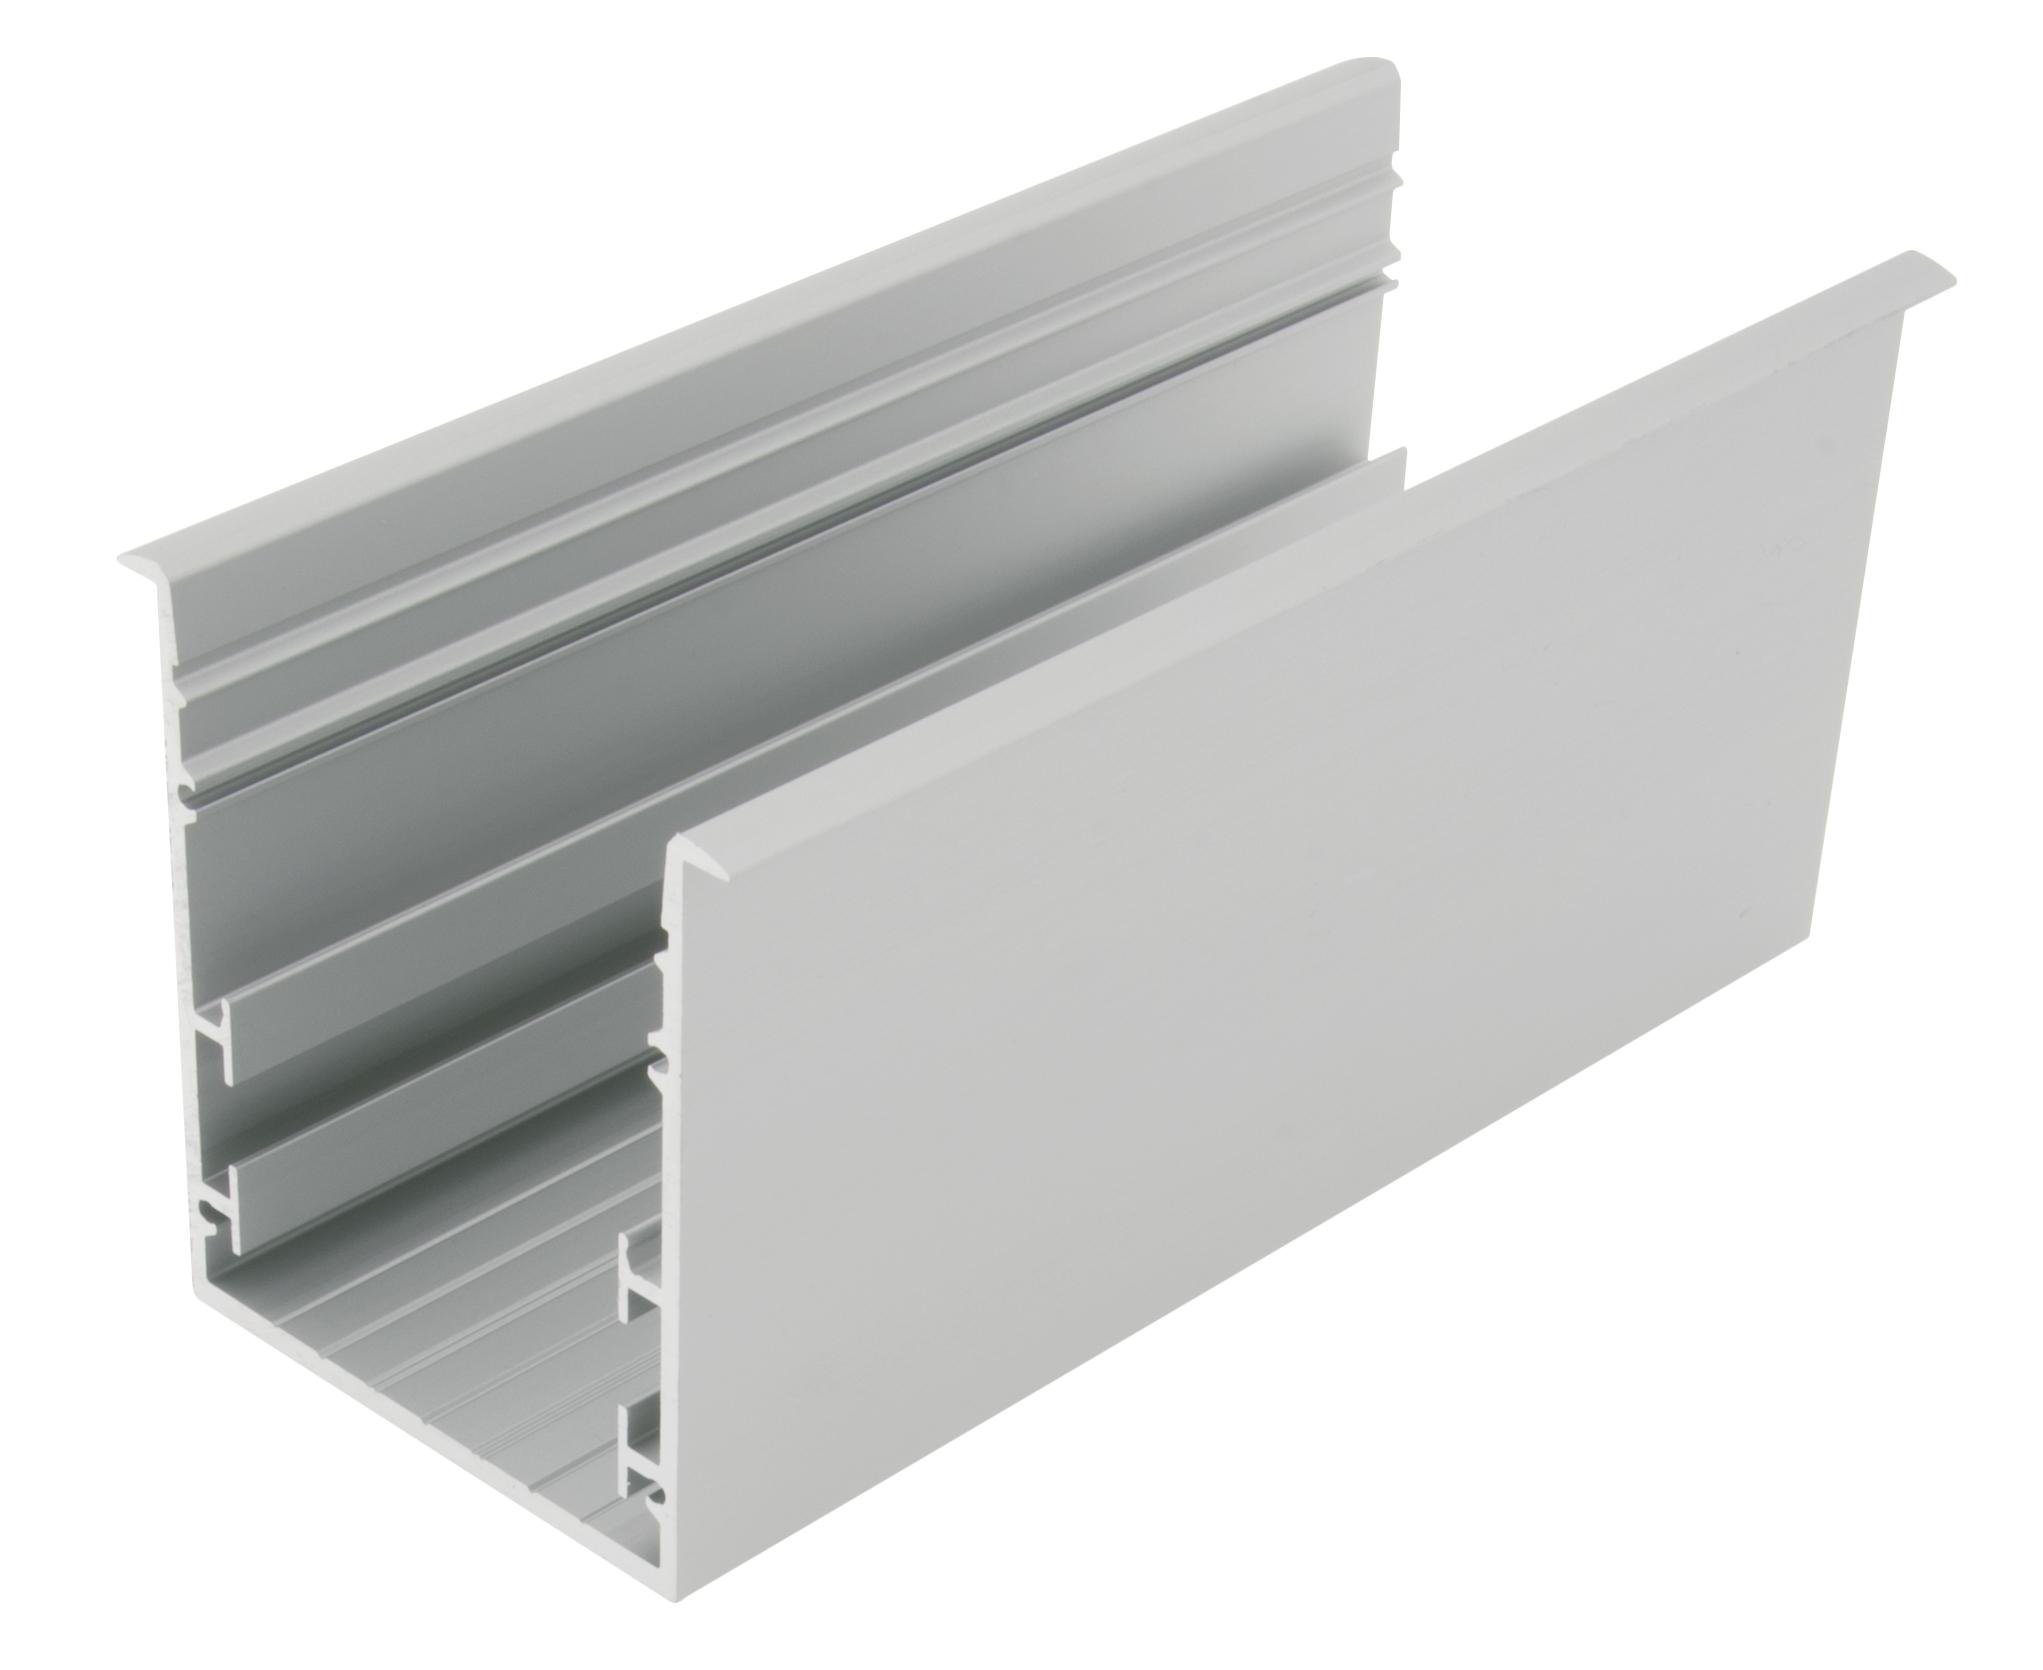 1 m Aluminium Profil SLT LIAP003005